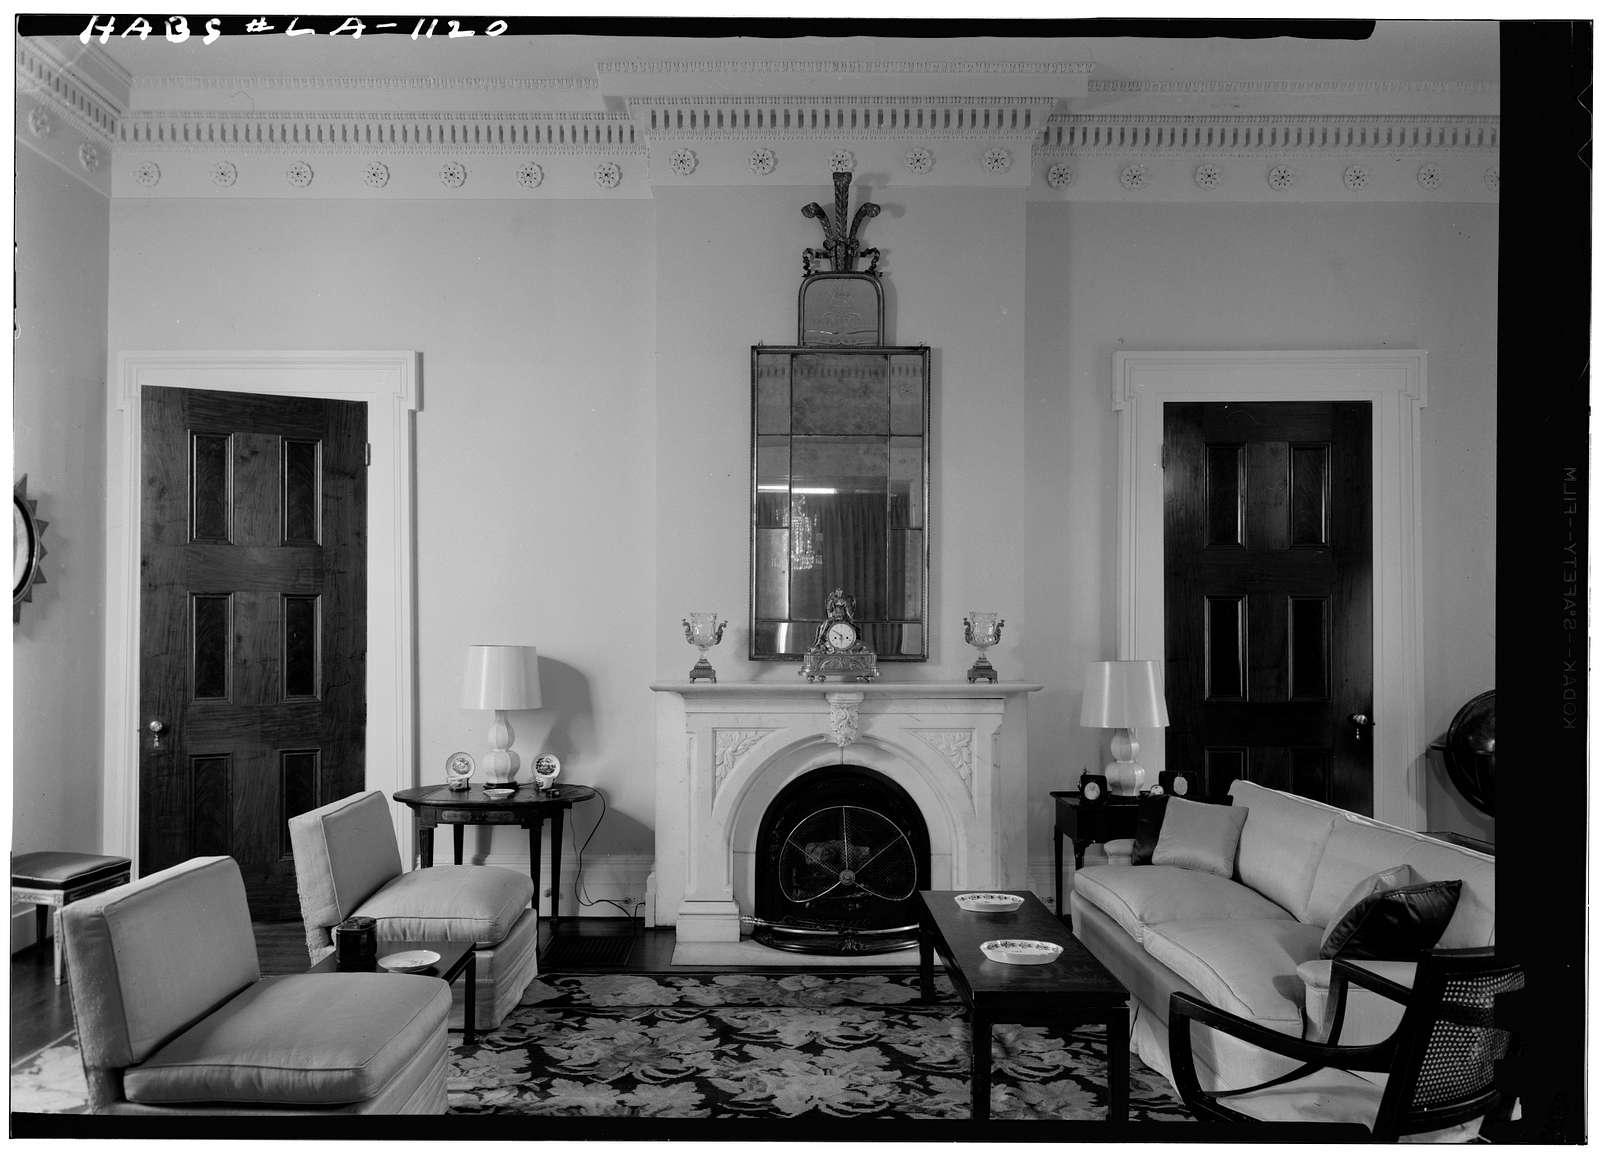 Robert A. Grinnan House, 2221 Prytania Street, New Orleans, Orleans Parish, LA